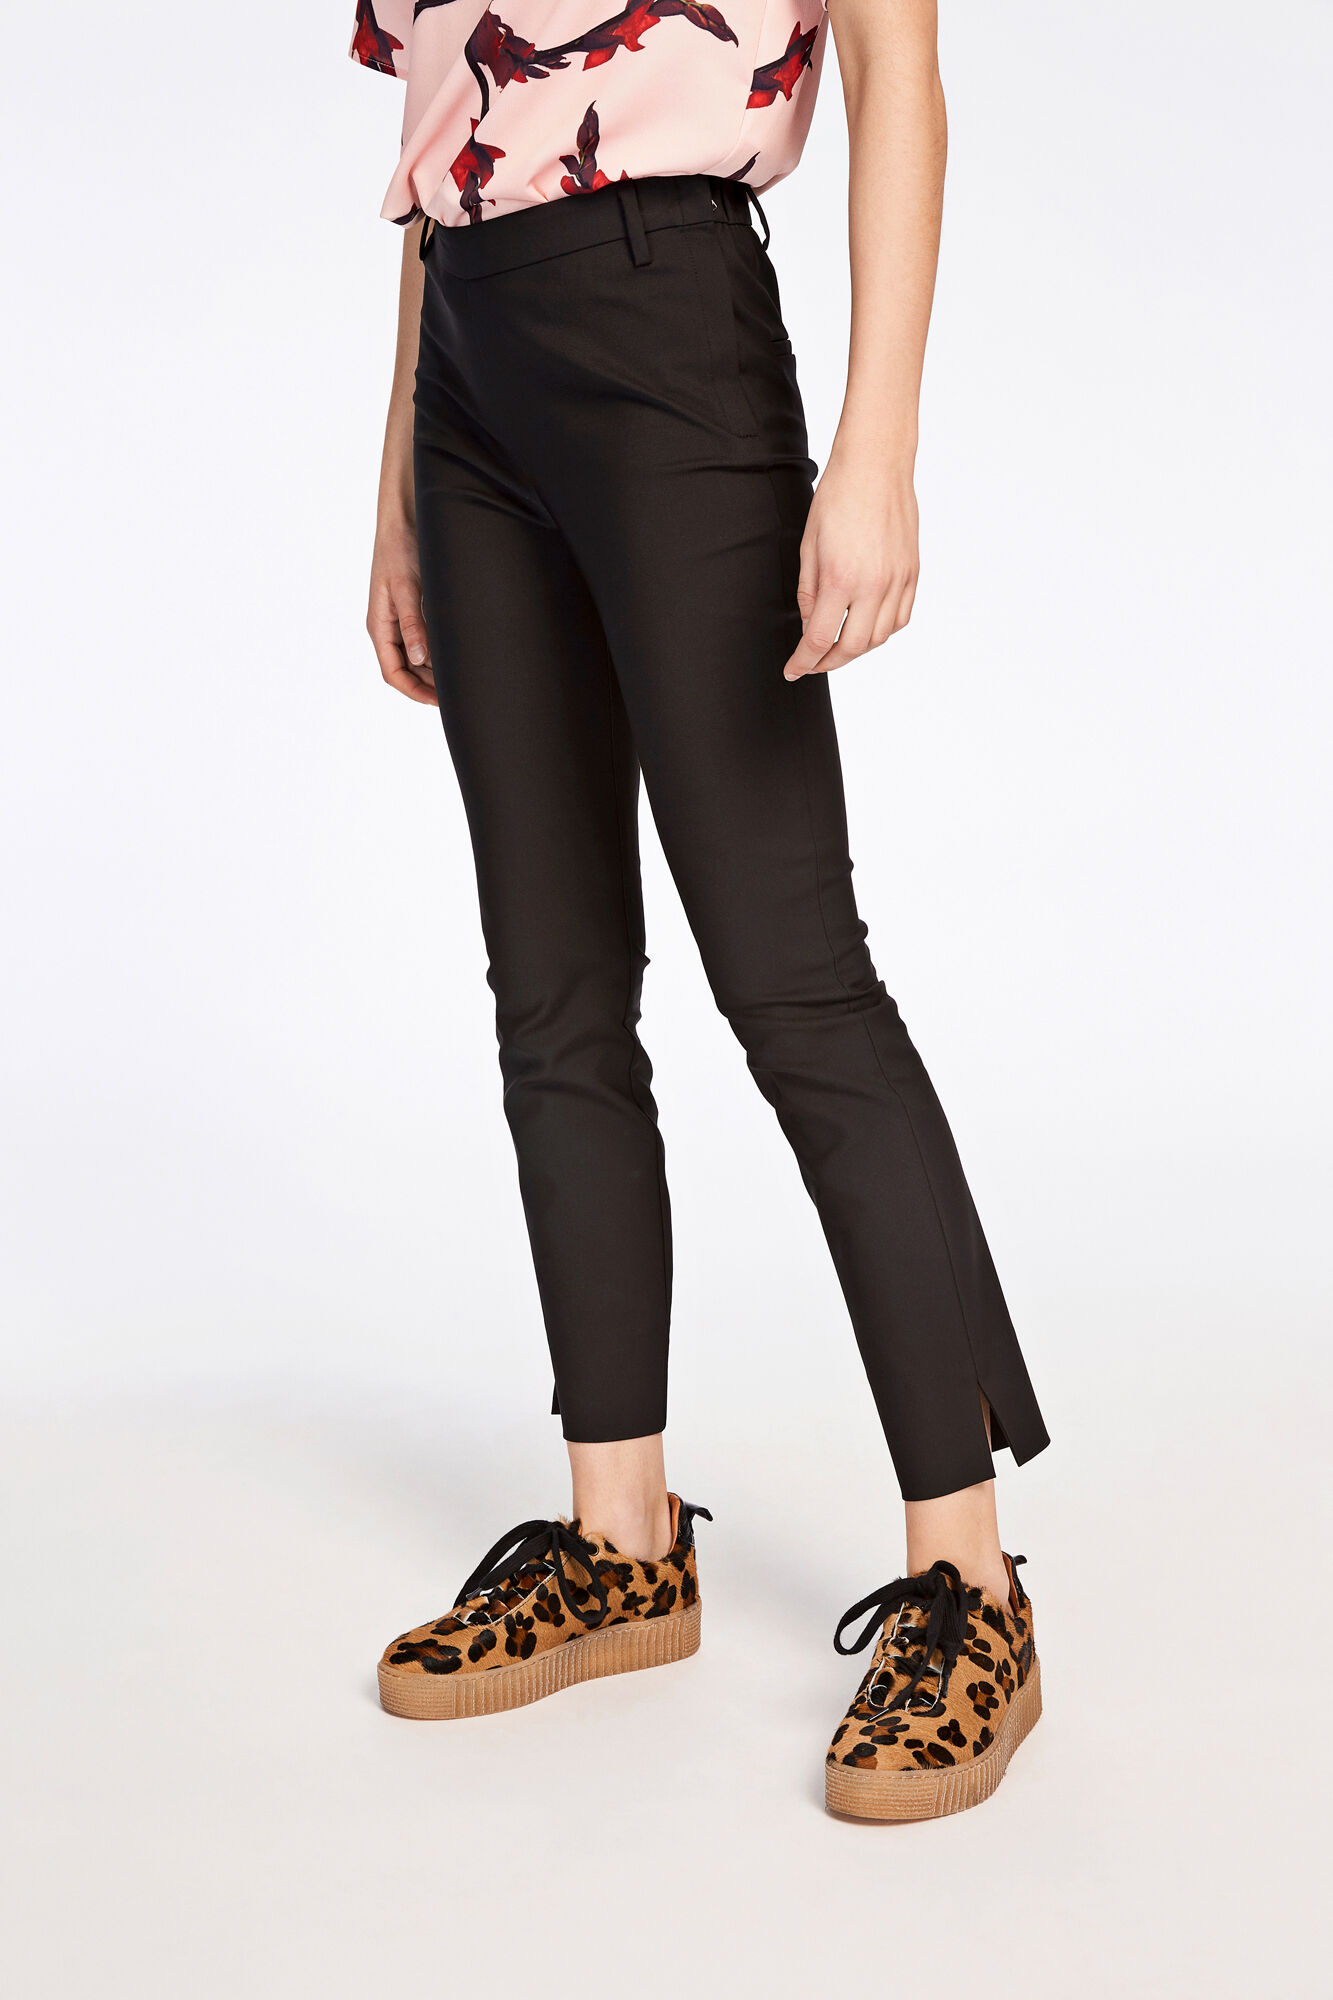 Lugo pants 6272, BLACK